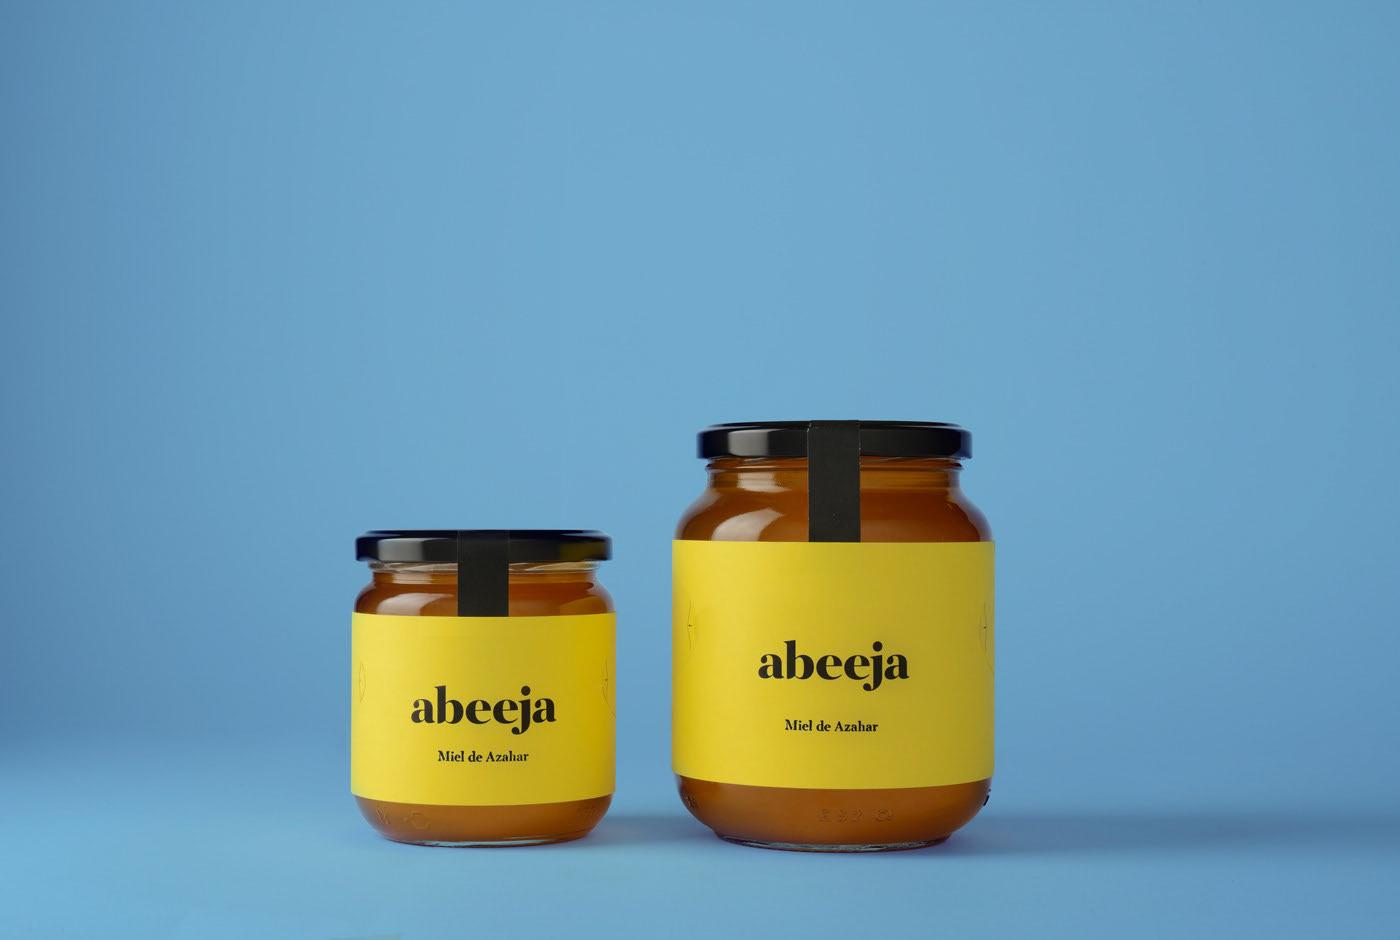 Abeeja — Honey Packaging by Andrés Guerrero - Creative Work